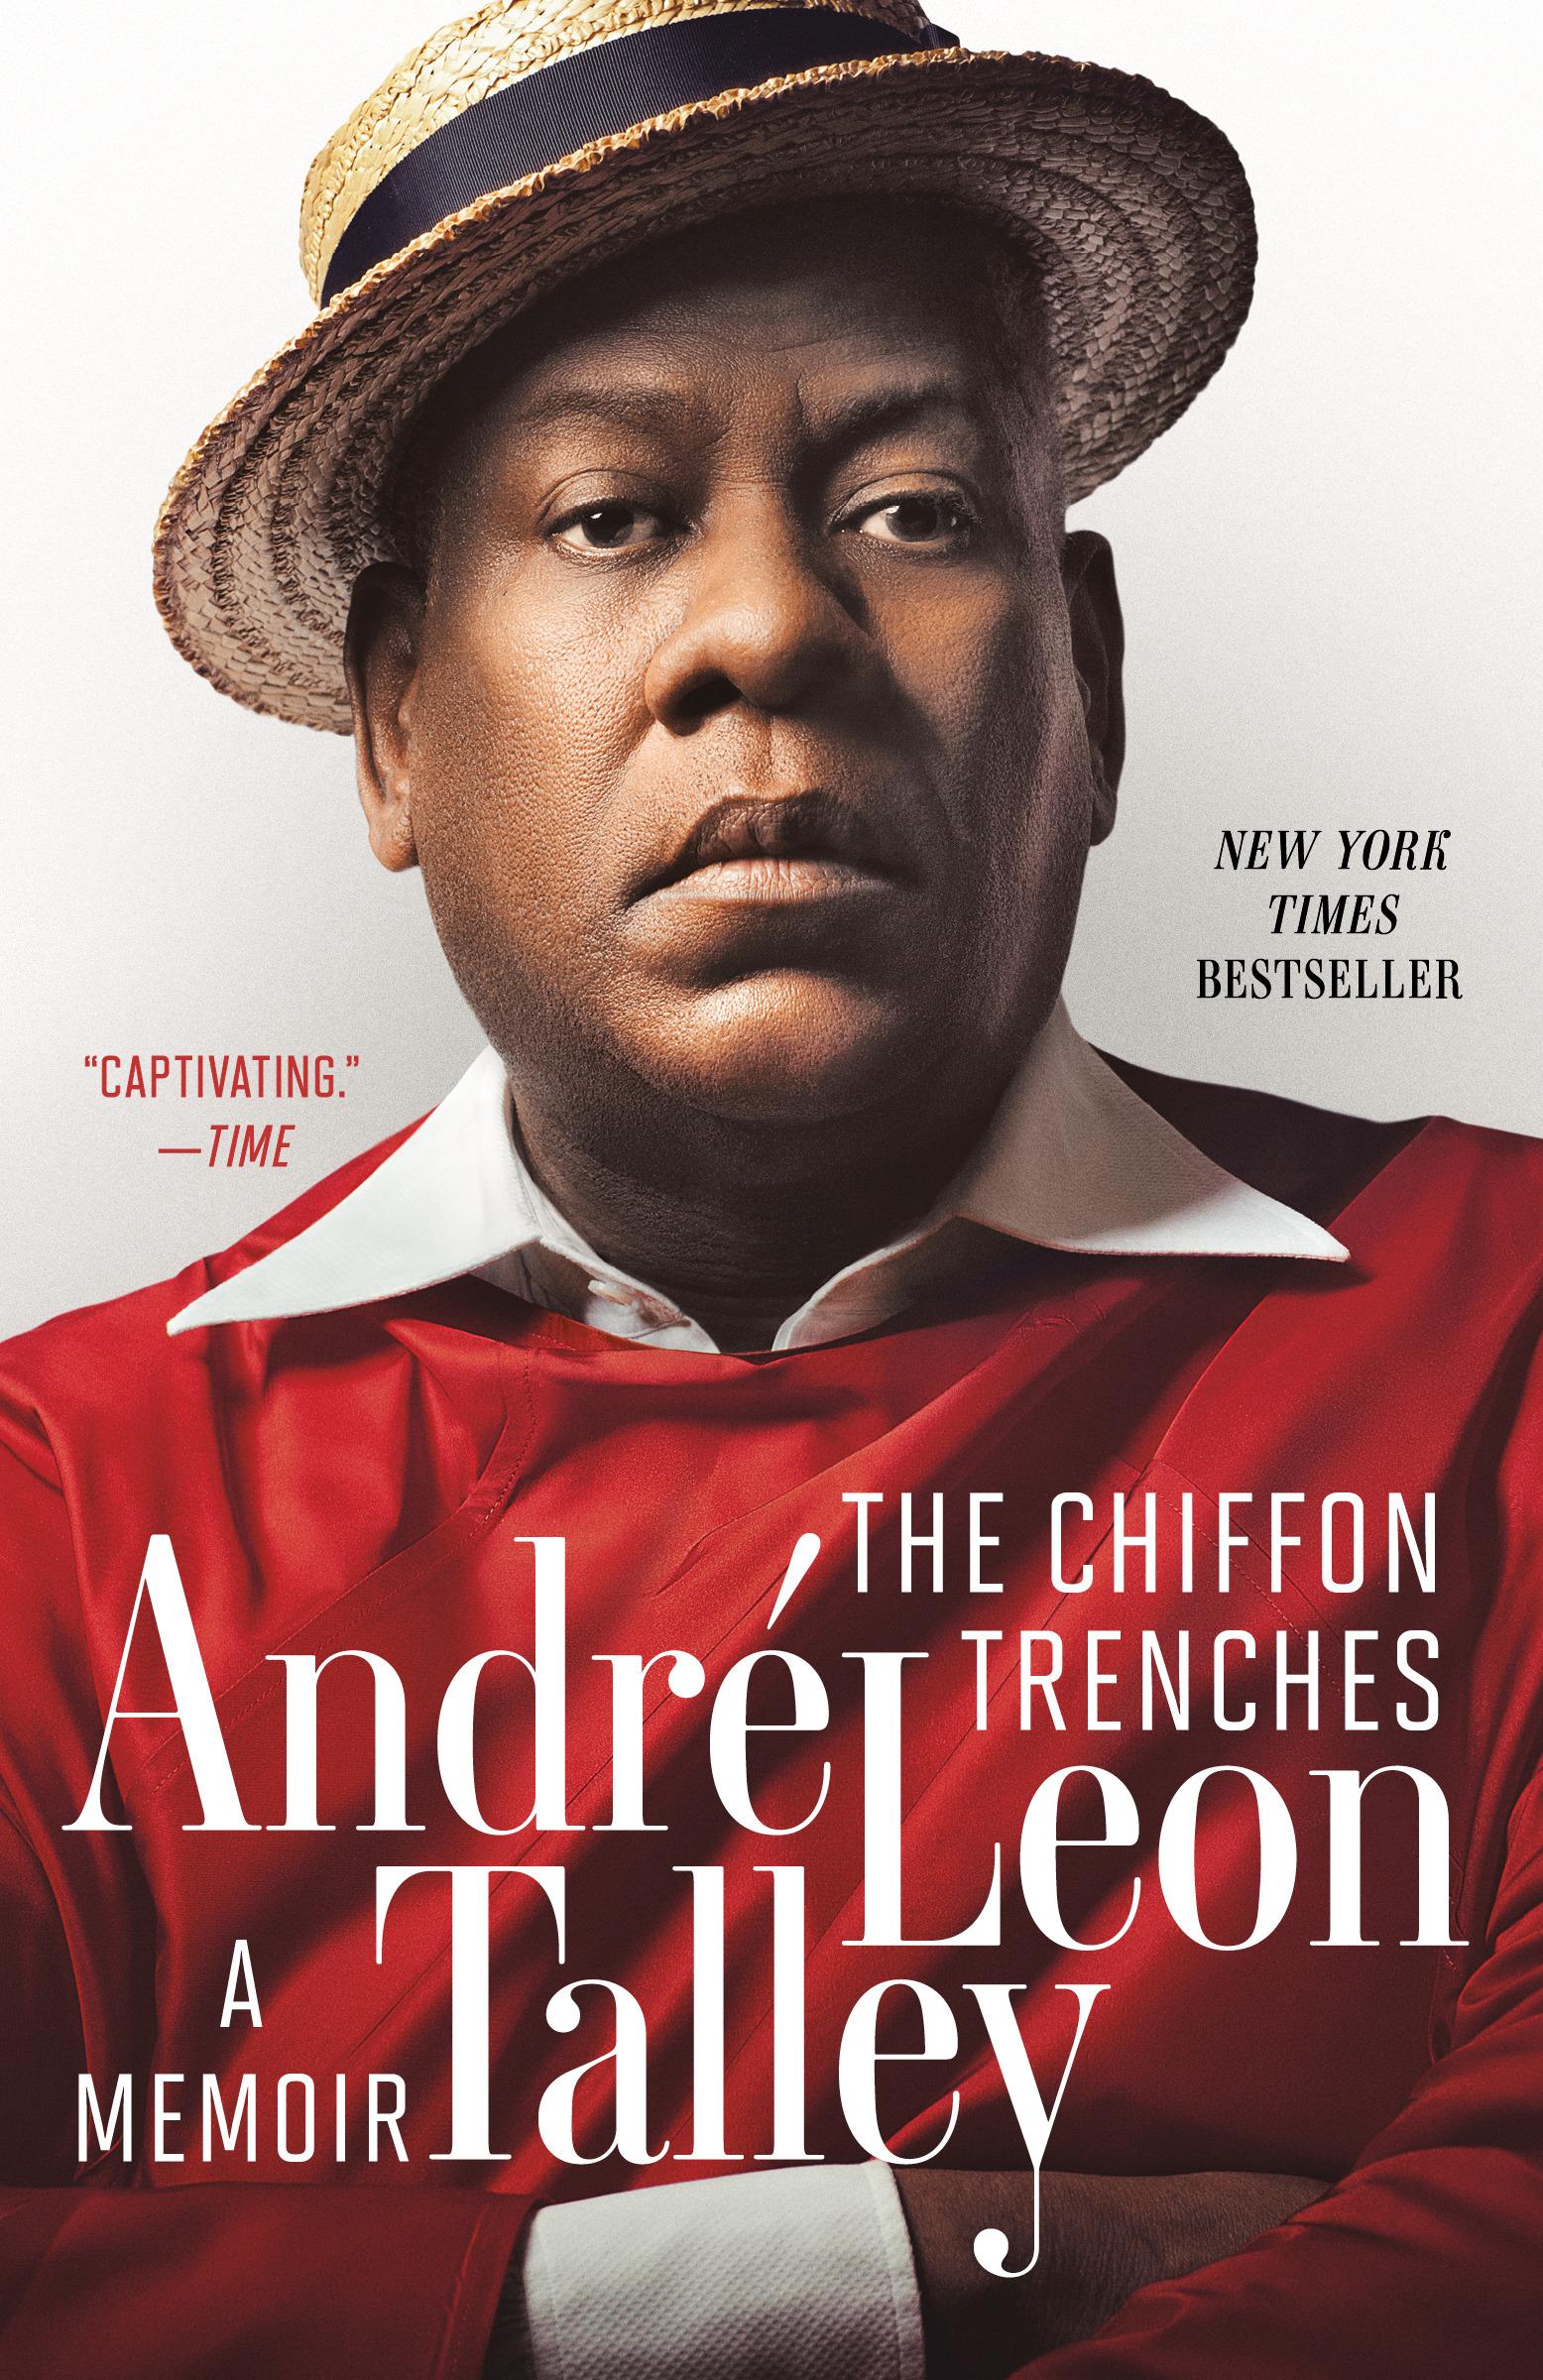 The Chiffon Trenches: A Memoir